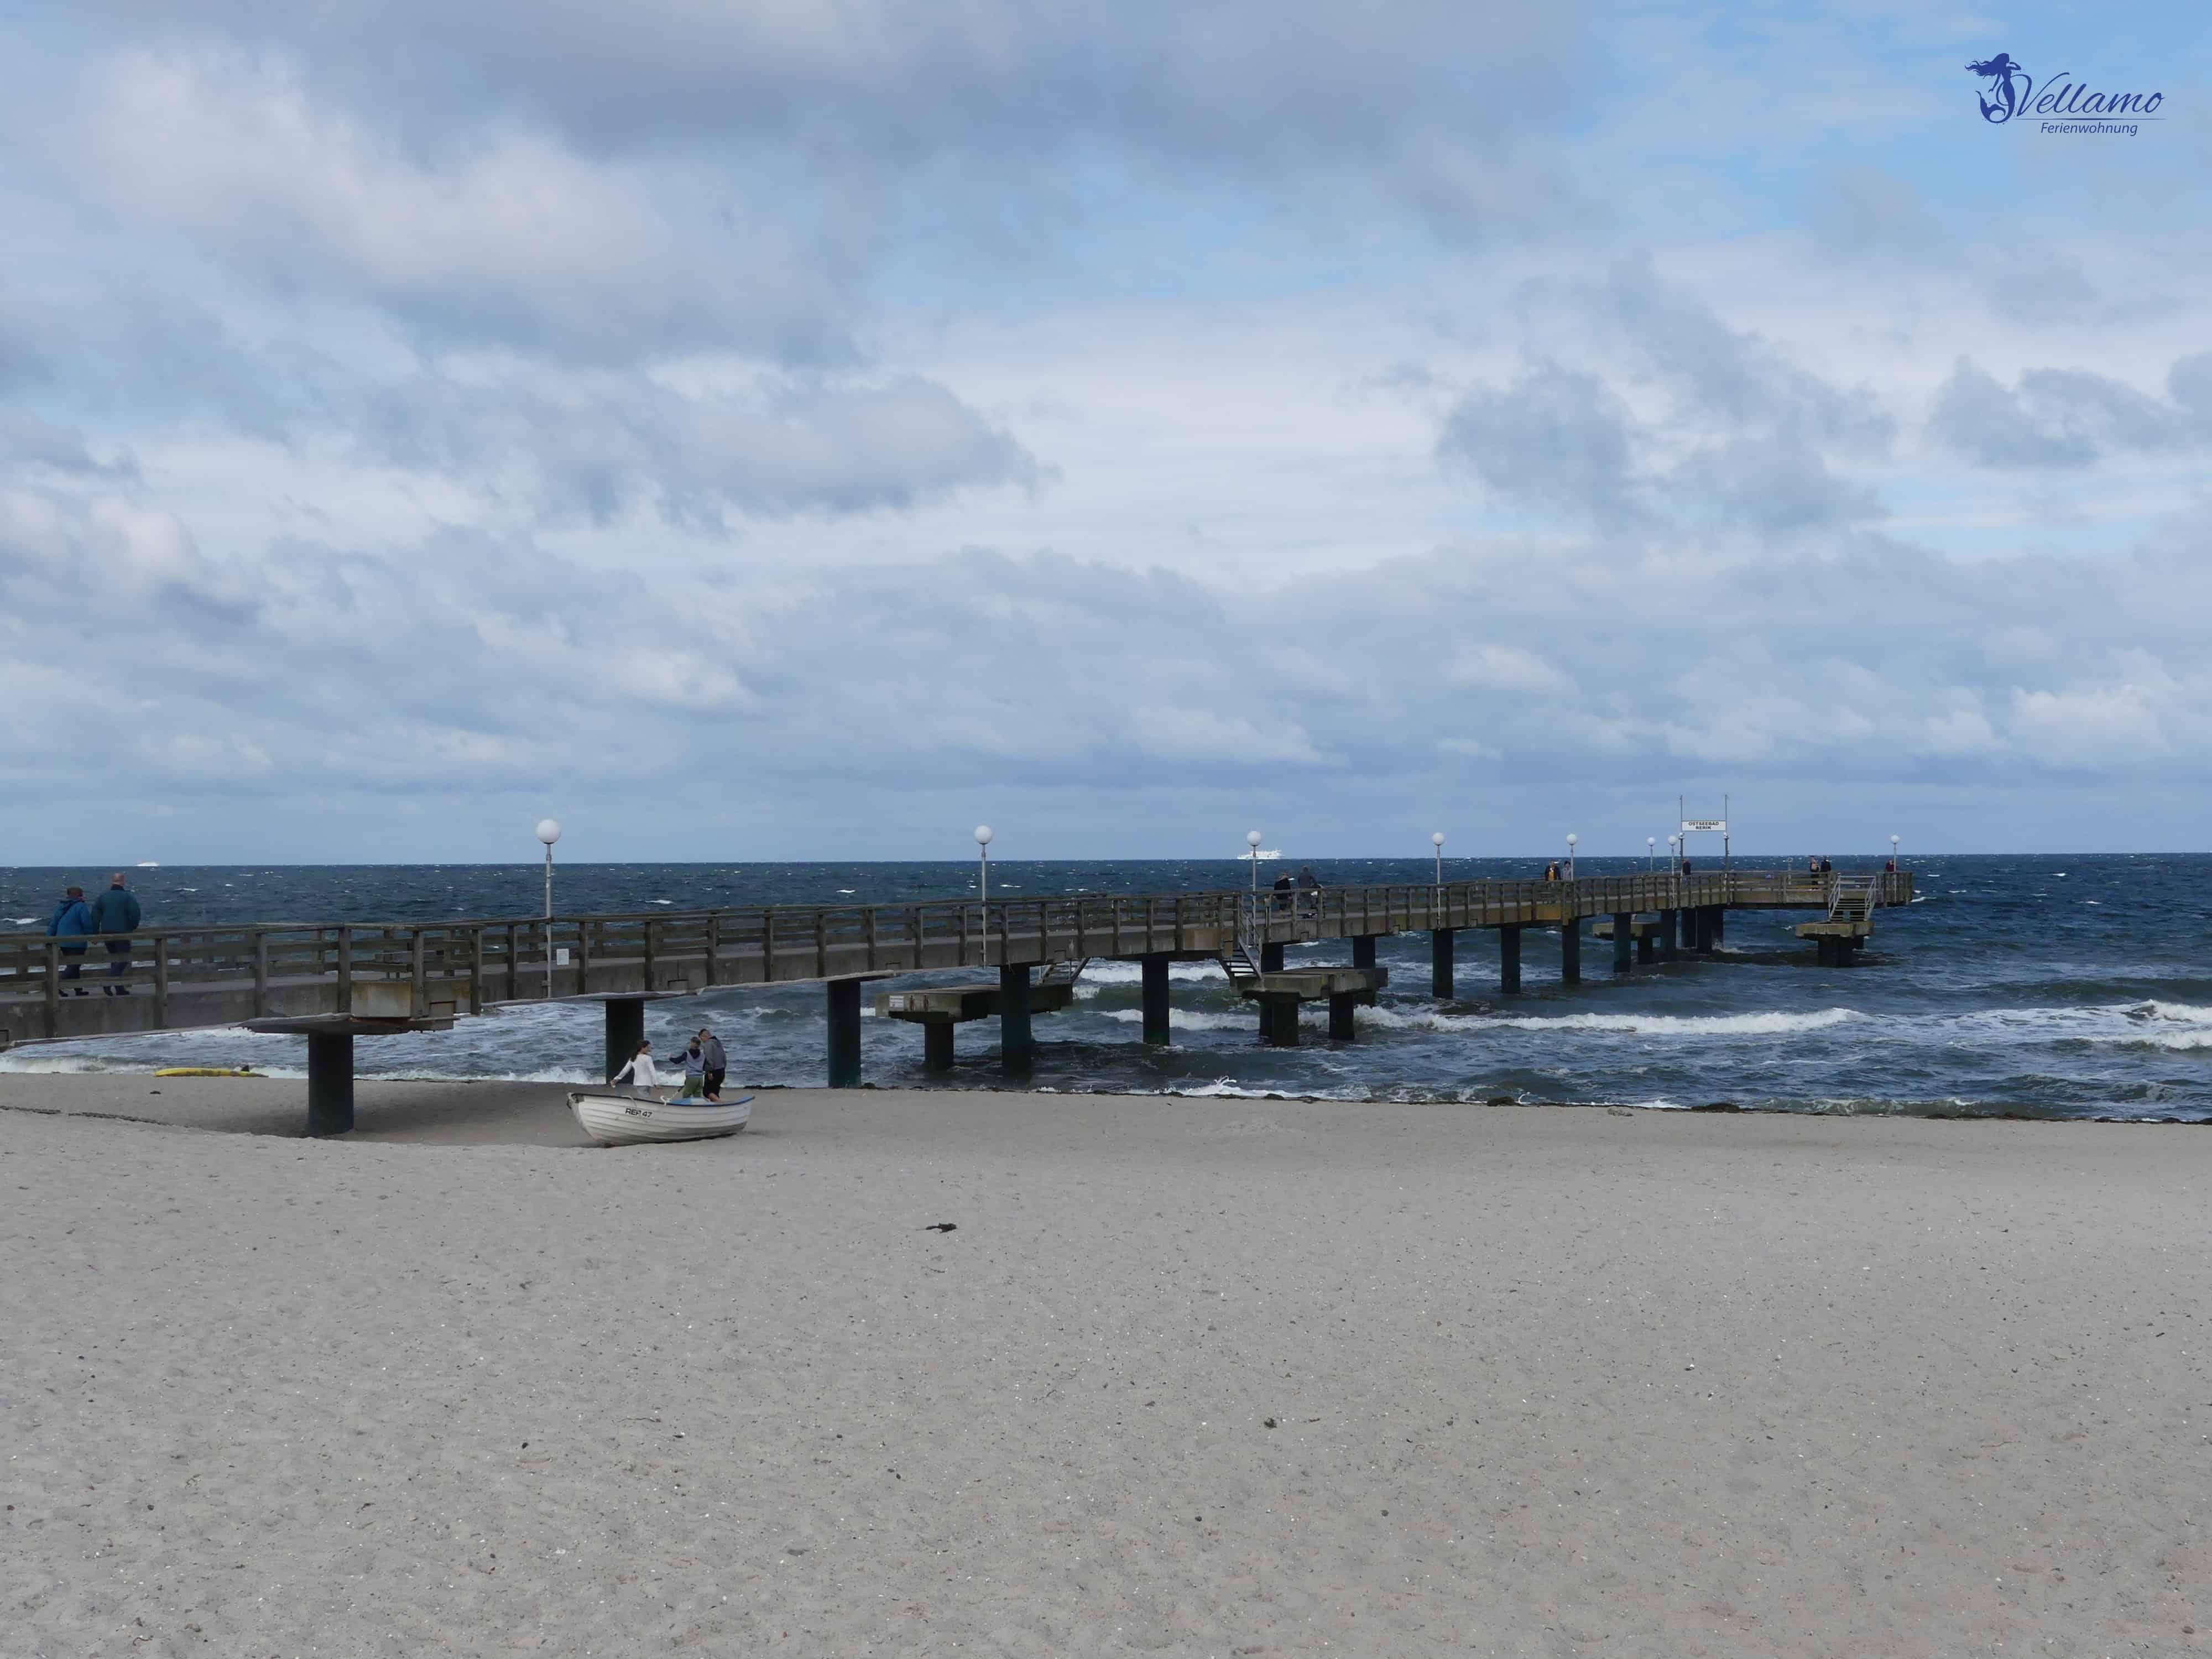 Ostseebad Rerik Bilder - Seebrücke Rerik